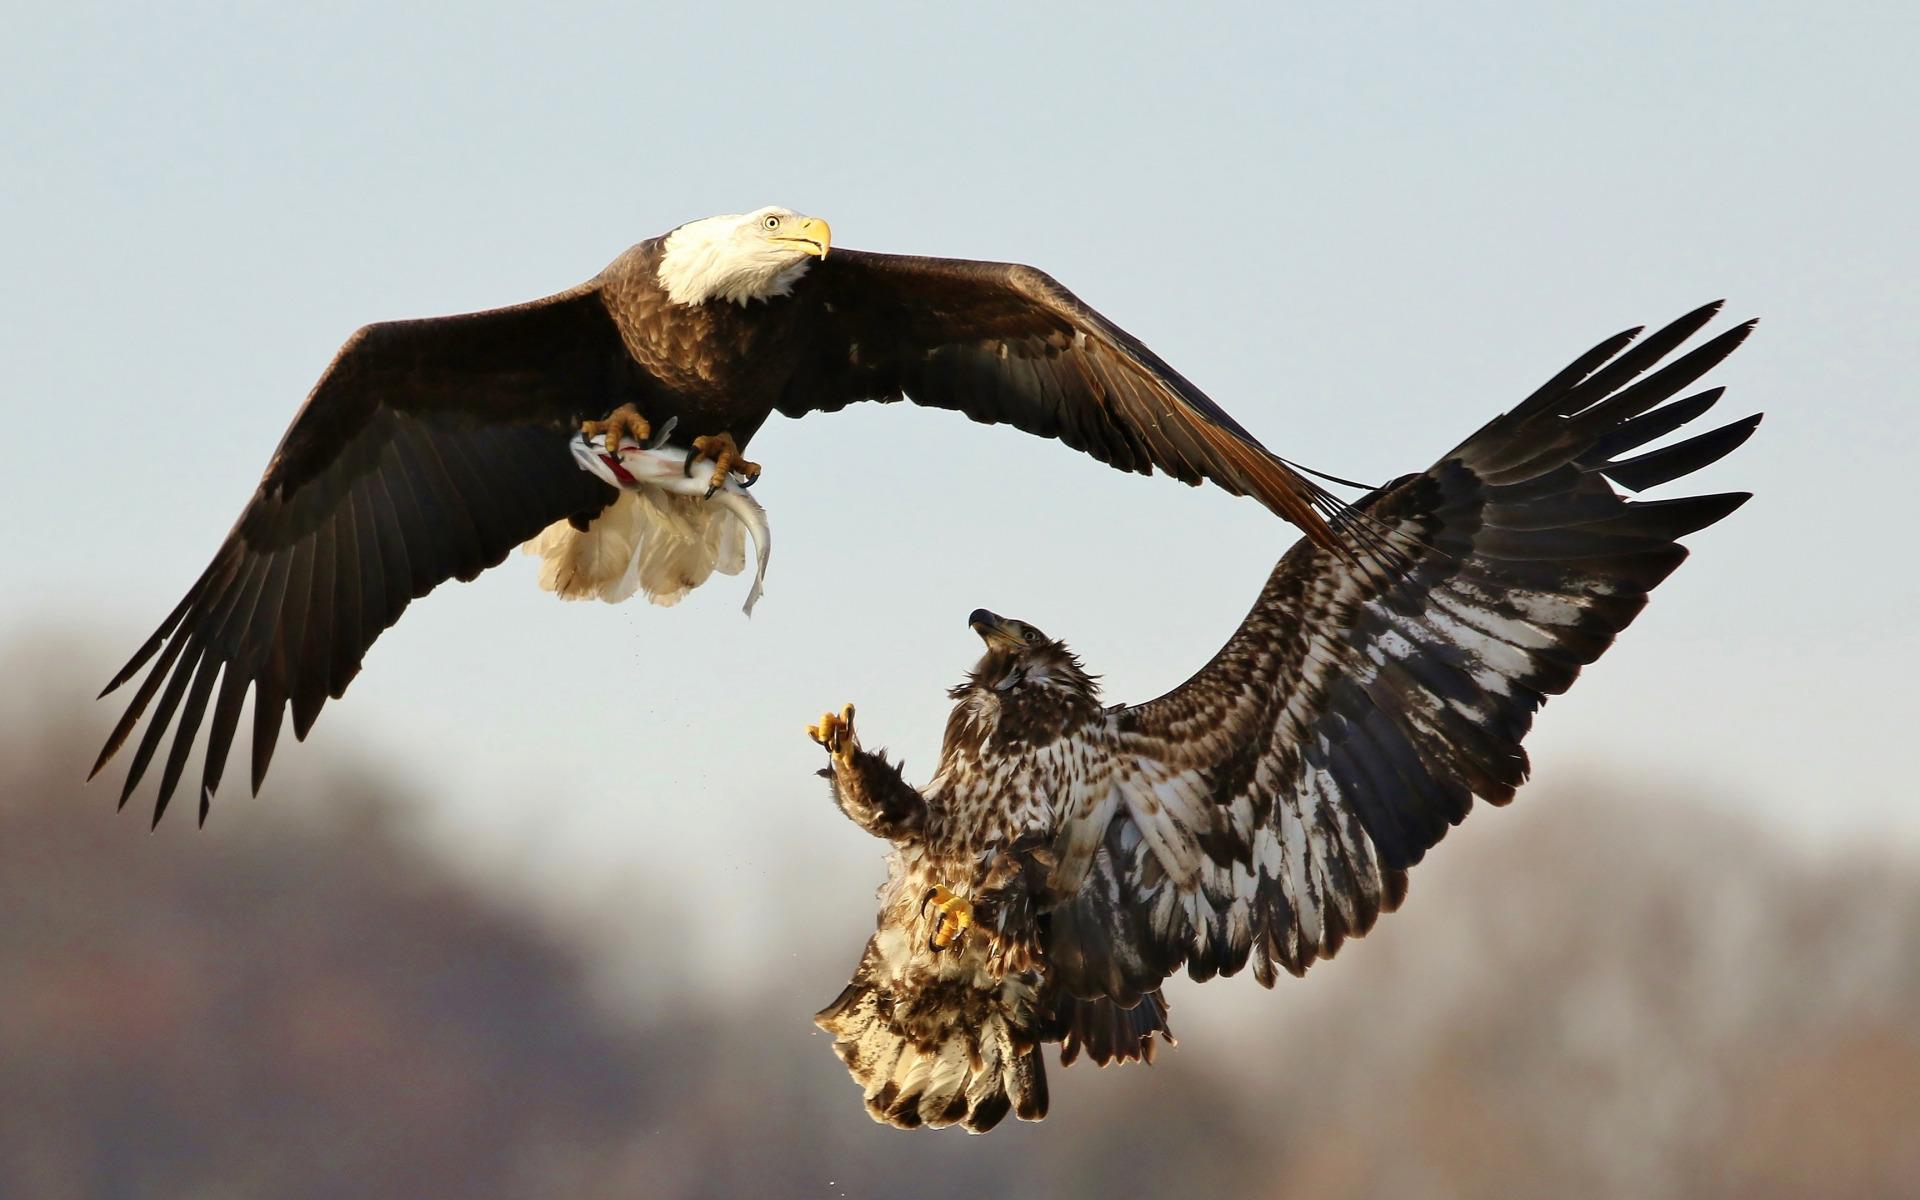 картинка два орла в небе пластины позволяют